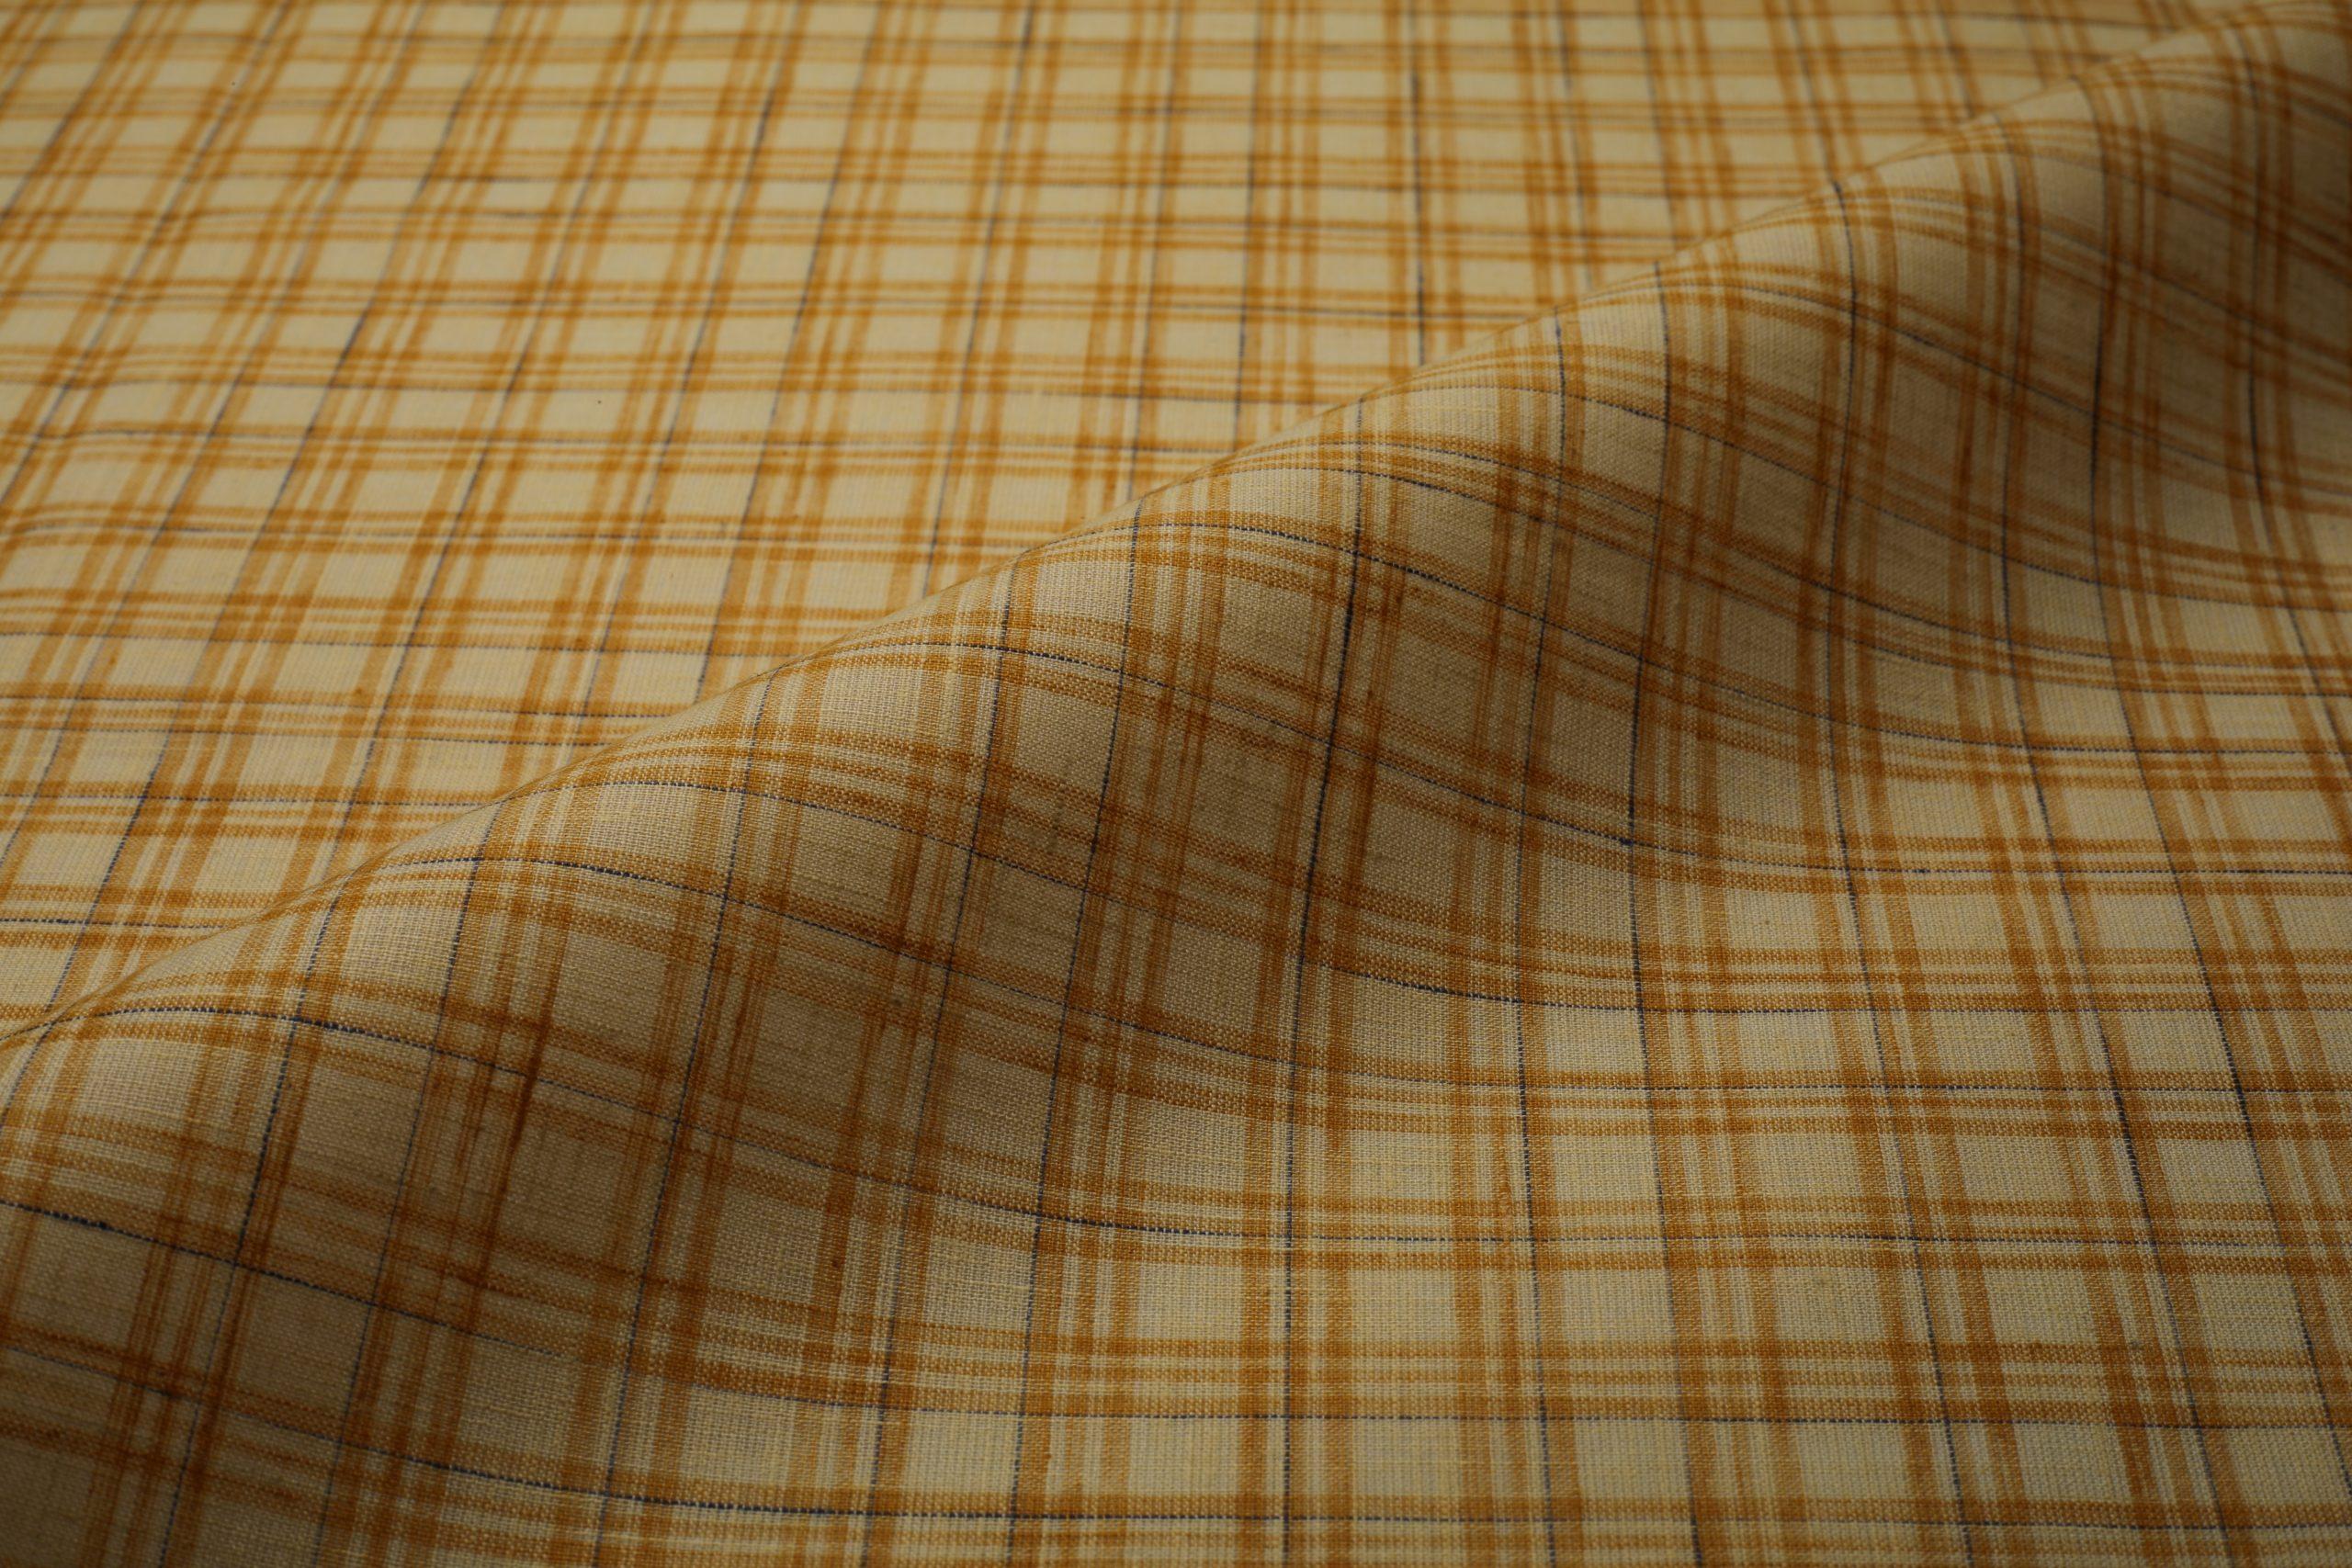 formal check shirt fabric